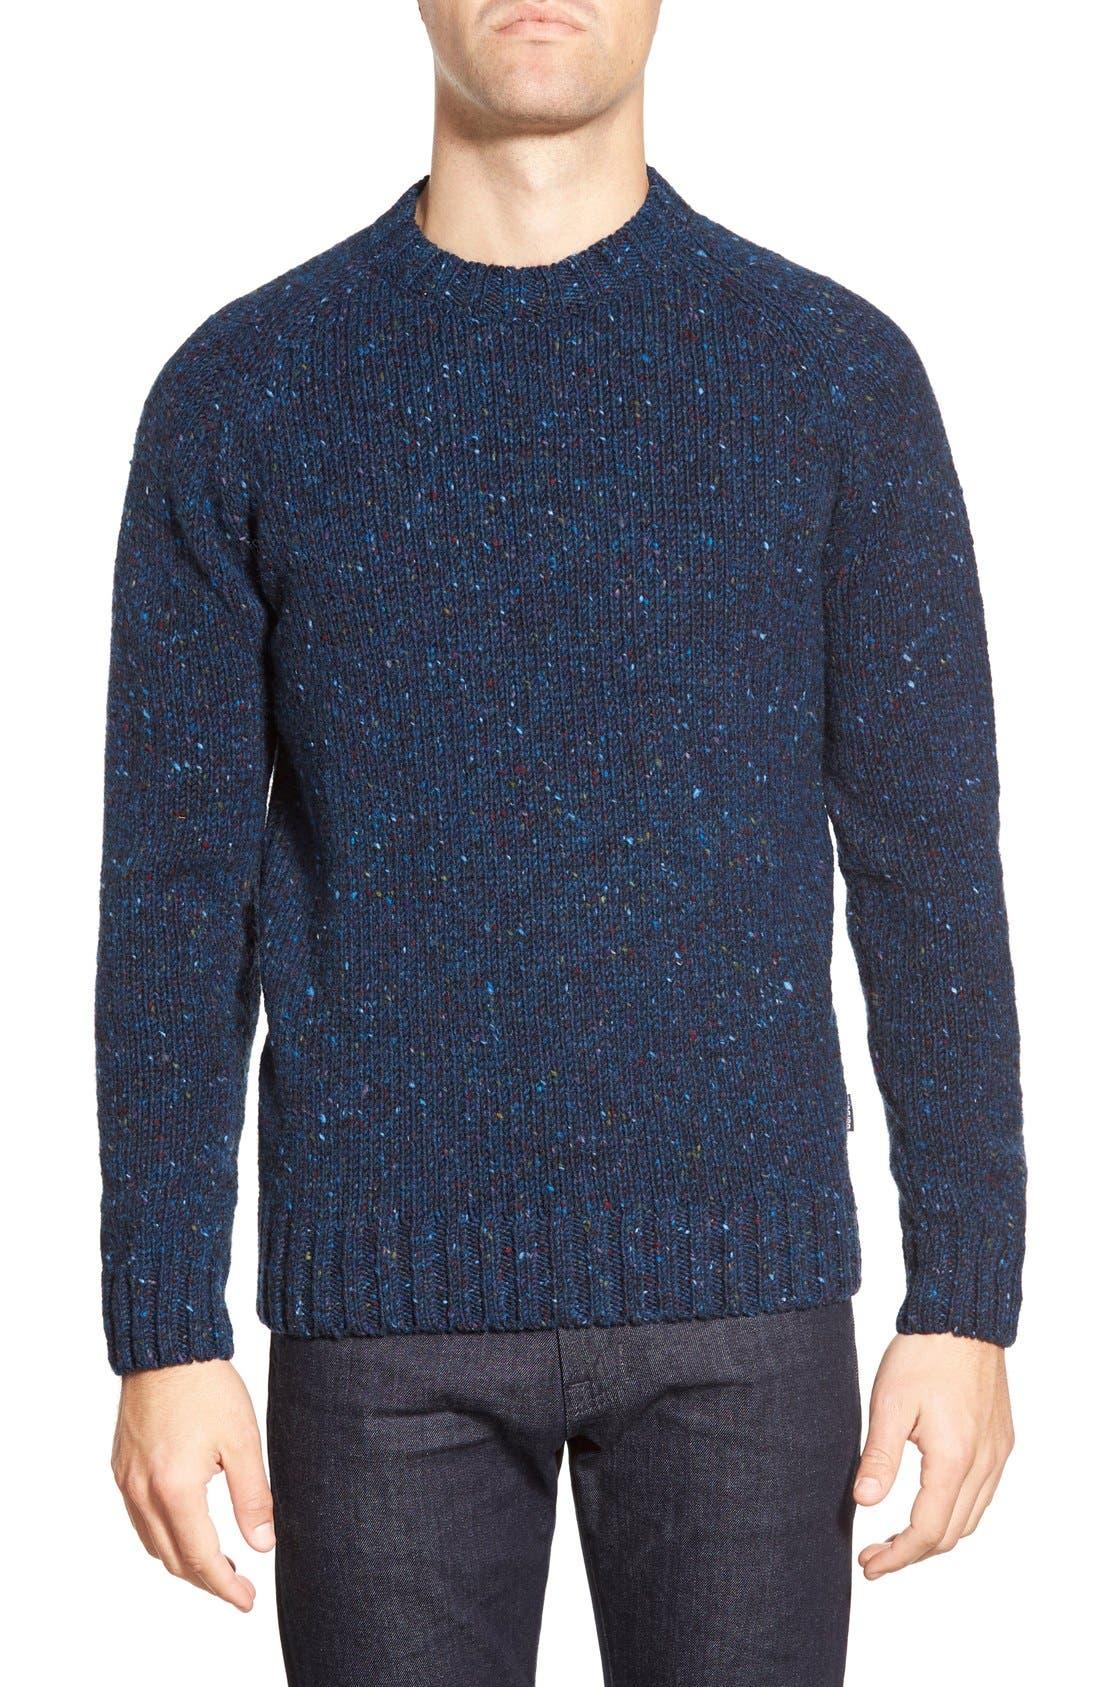 'Netherby' Kilcara Tweed Crewneck Sweater,                             Main thumbnail 1, color,                             400